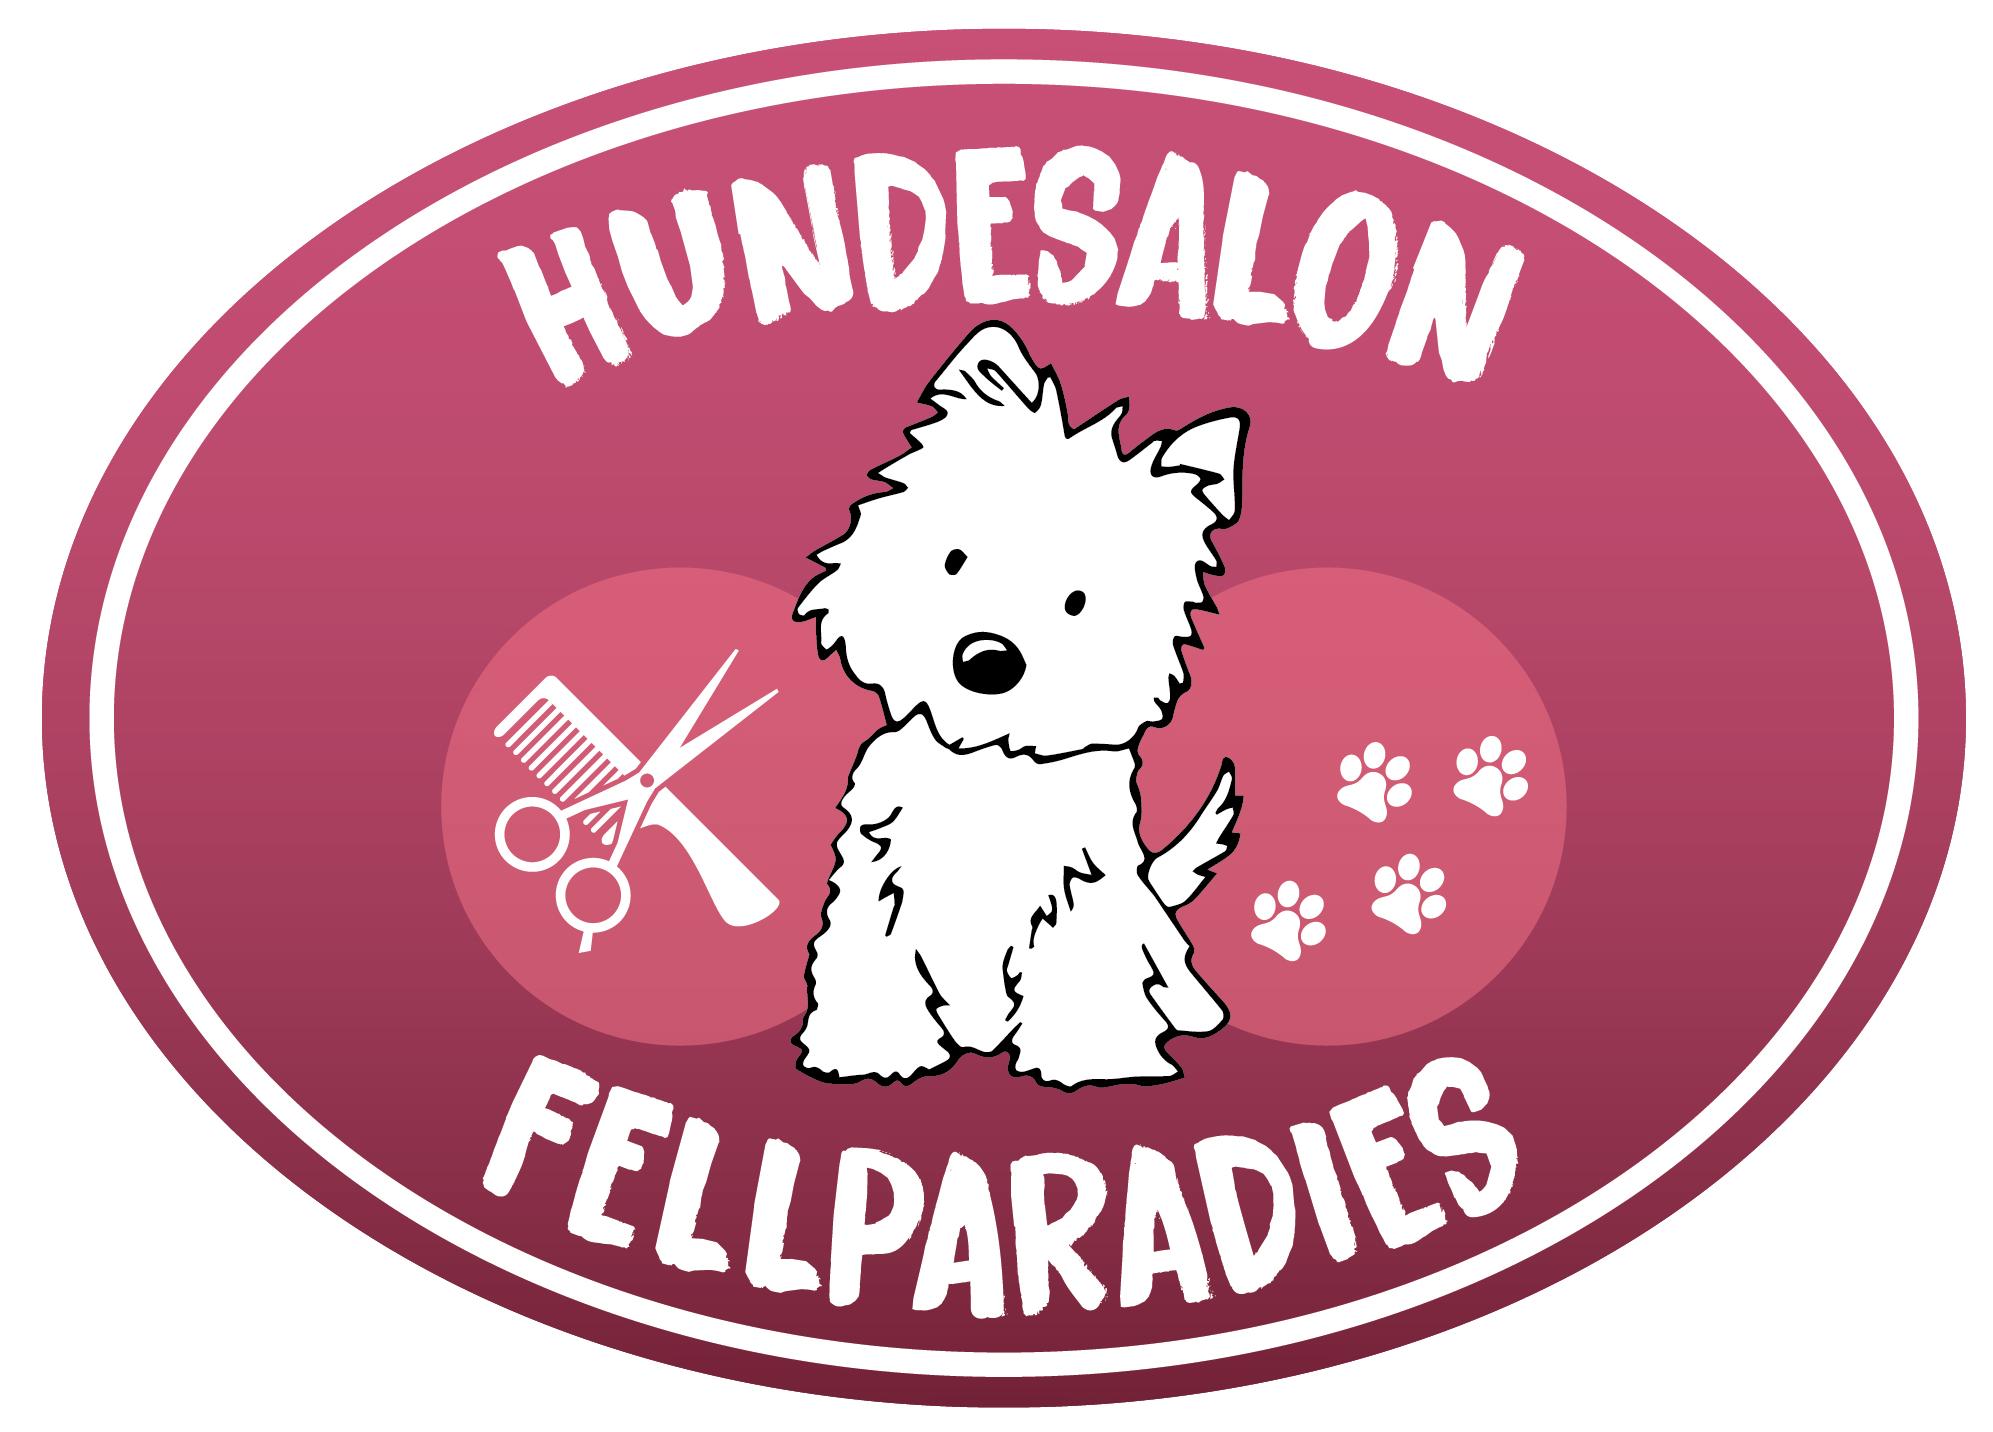 Hundesalon Fellparadies